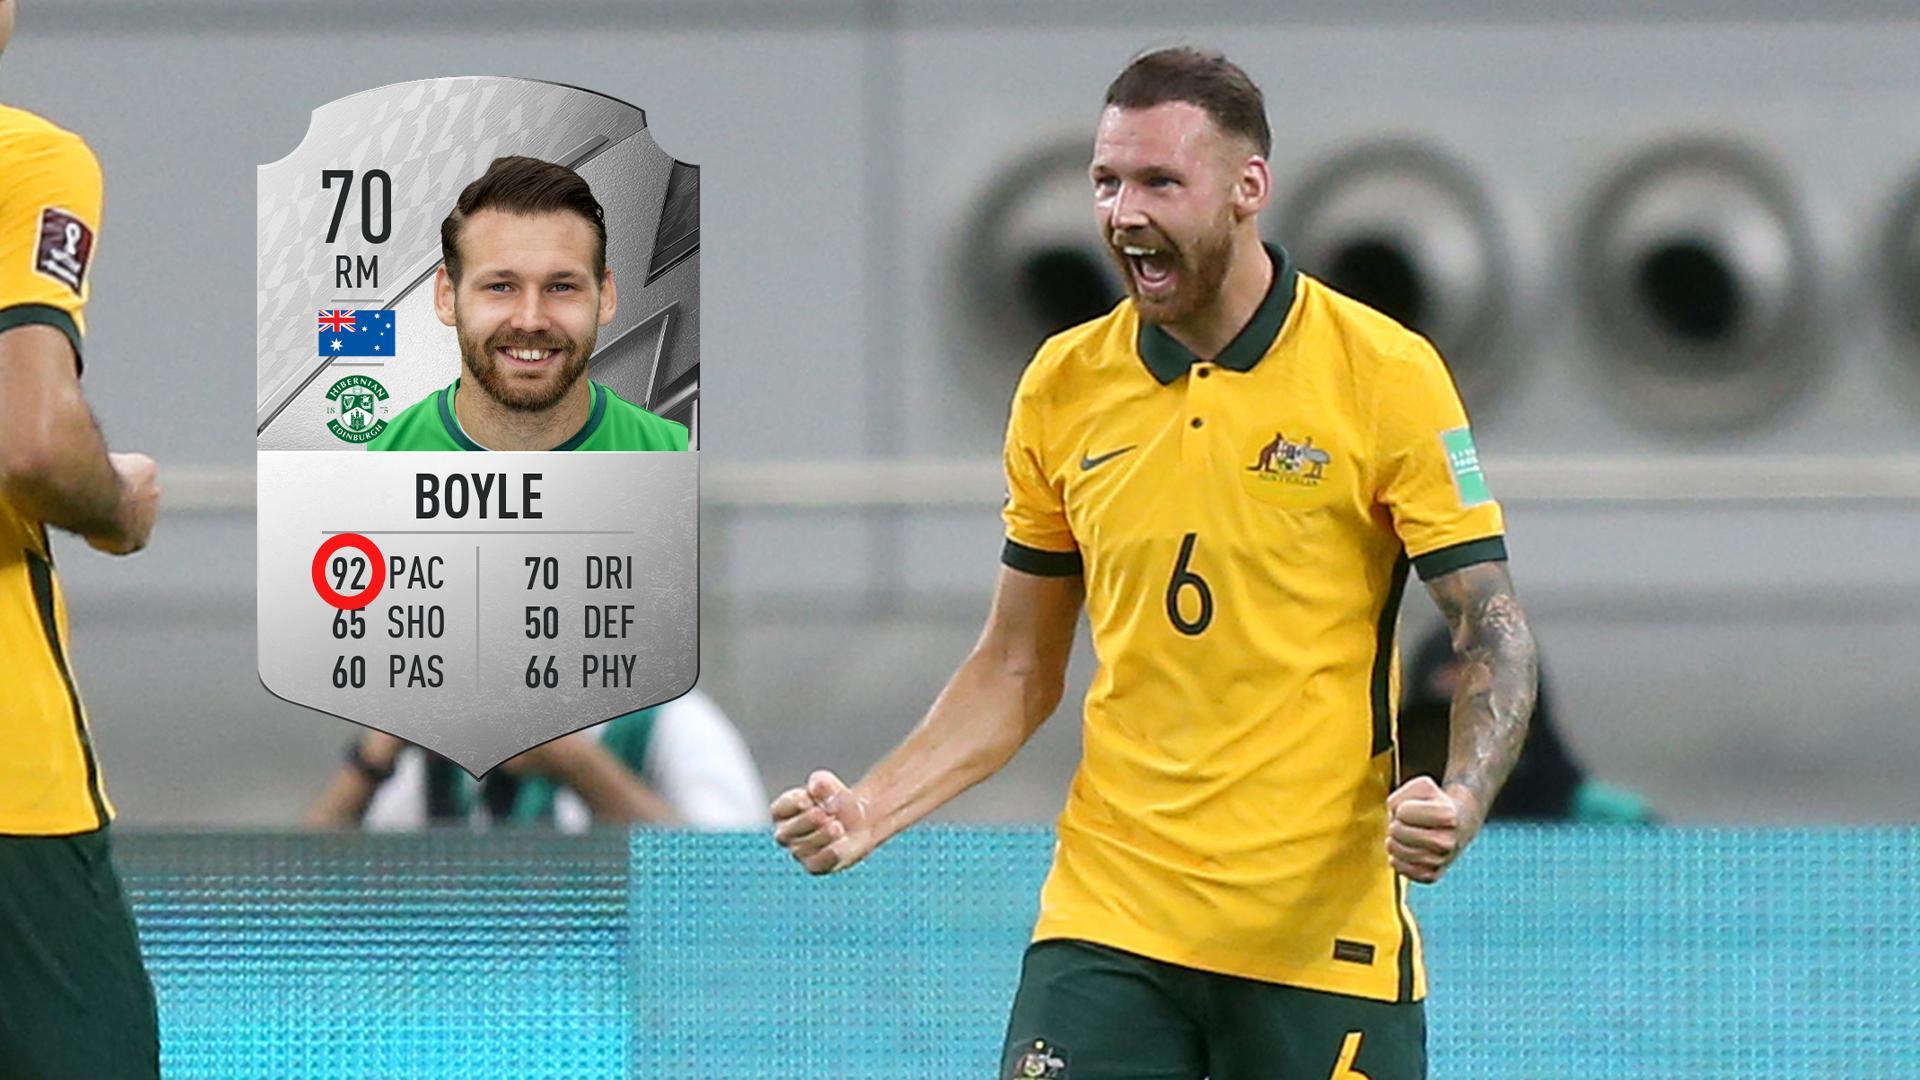 Boyle Stats